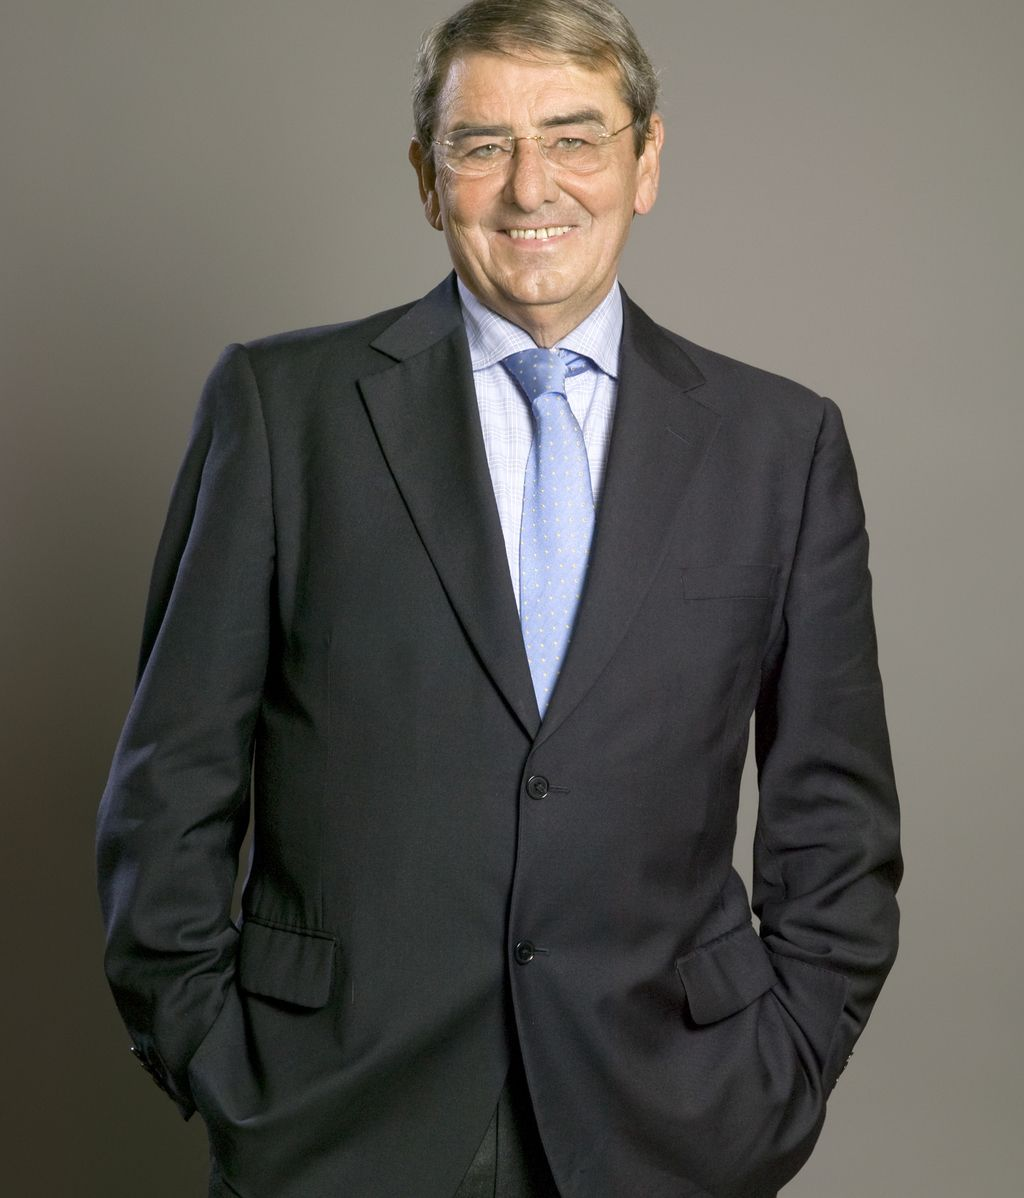 Alejandro Echevarria